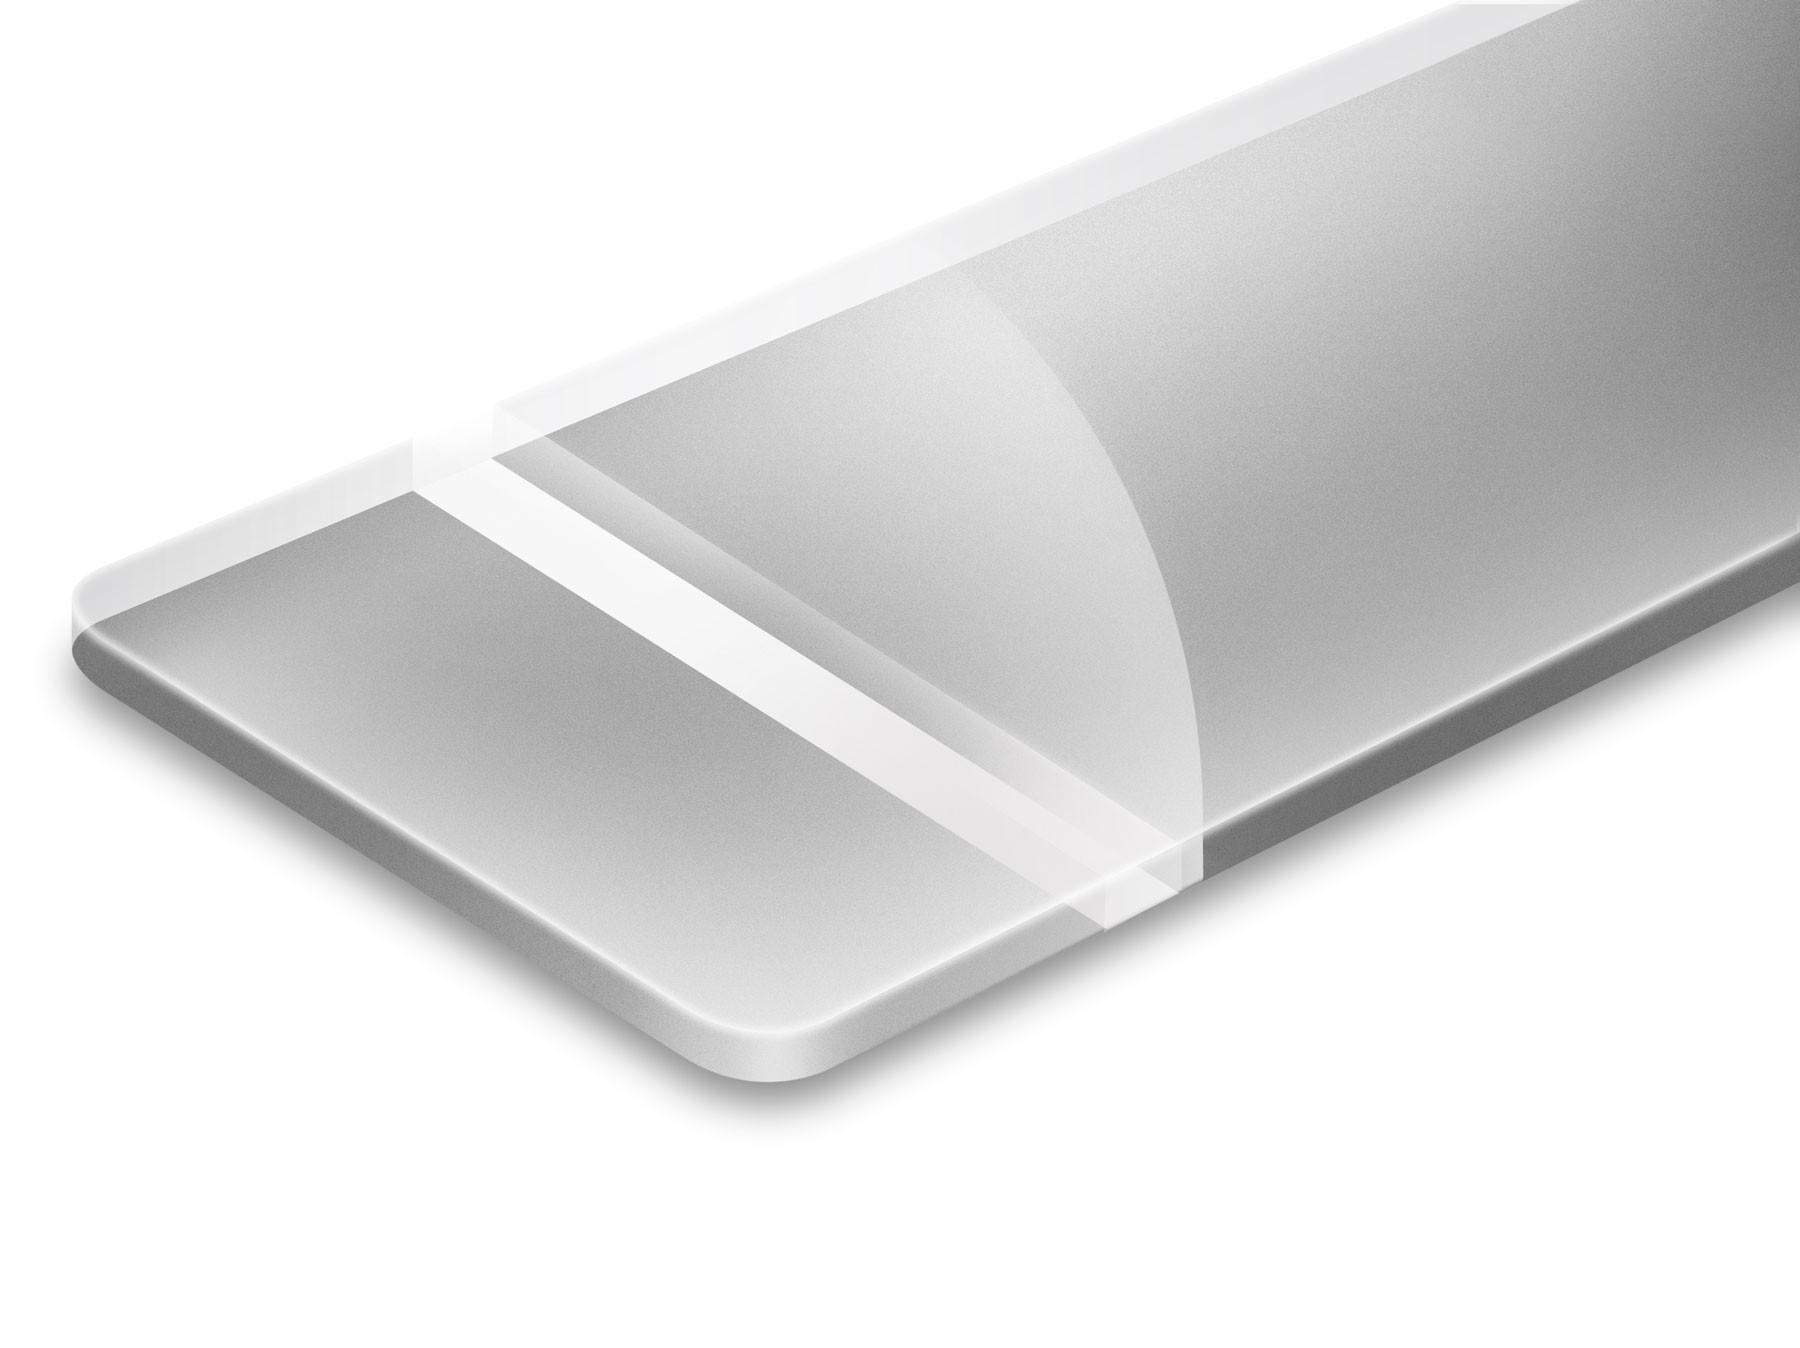 TroLase Reverse, Gloss/Silver, 2ply, 1.6 mm